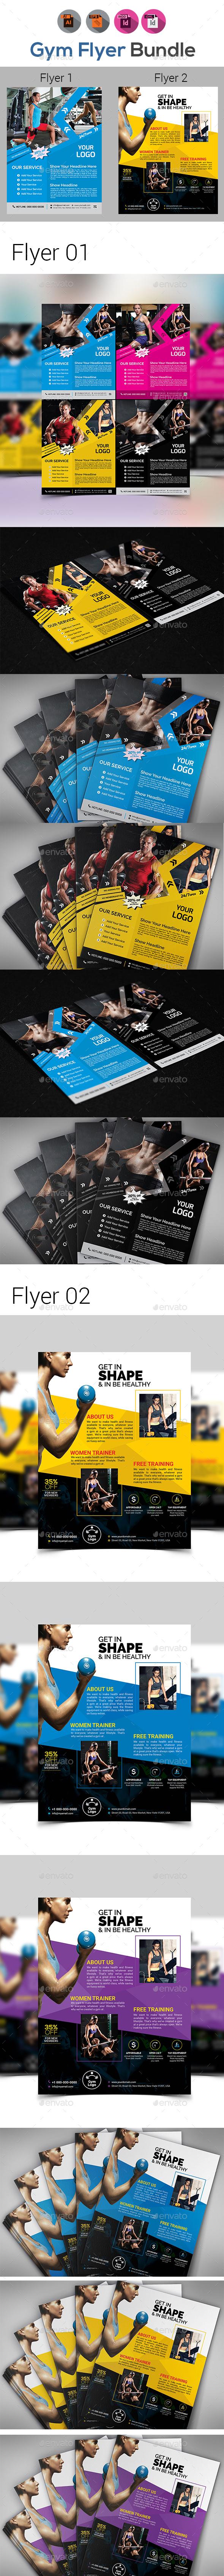 Sports | Fitness | Gym Flyer Bundle - Sports Events